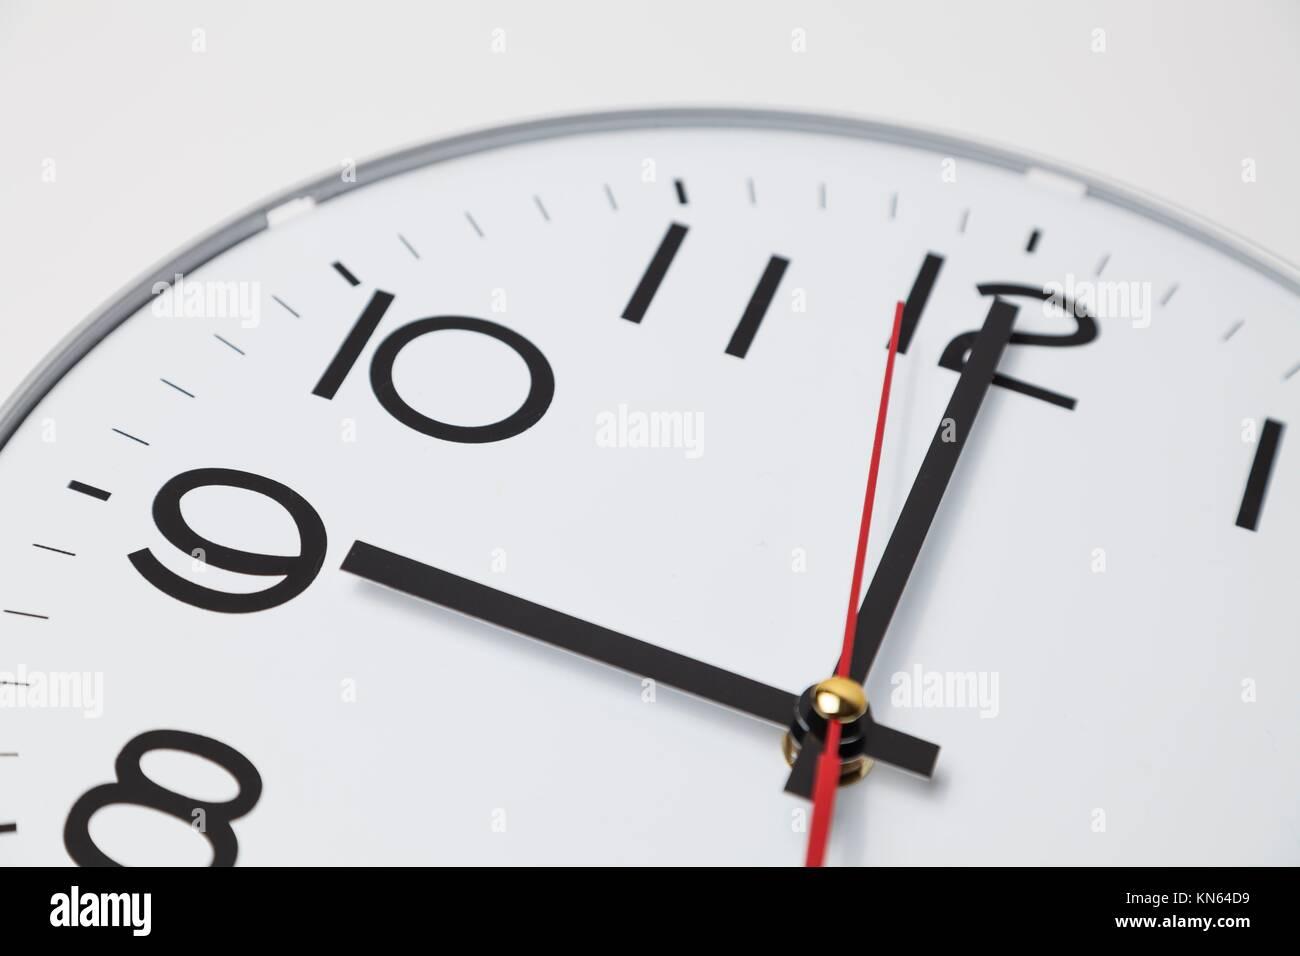 9 o'clock. - Stock Image